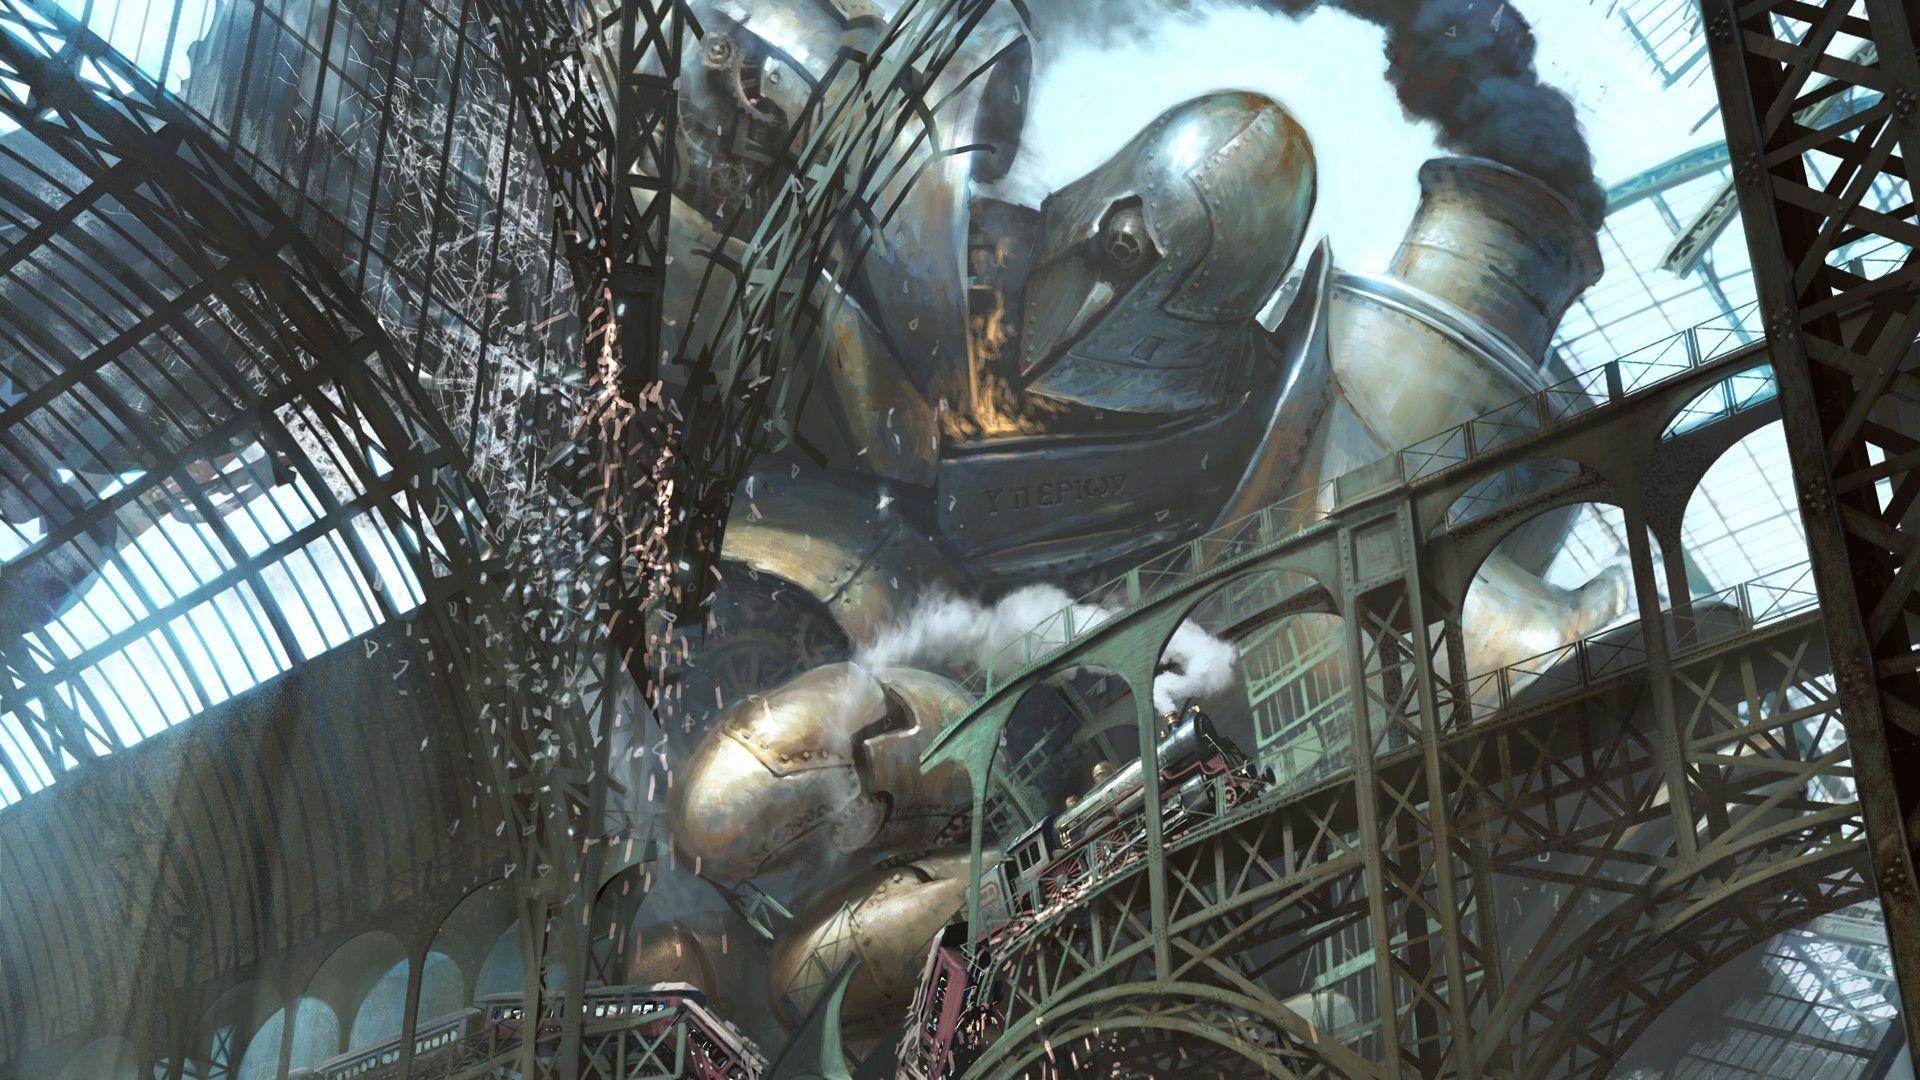 Pin By Elena Callegari On Steampunk Steampunk Wallpaper